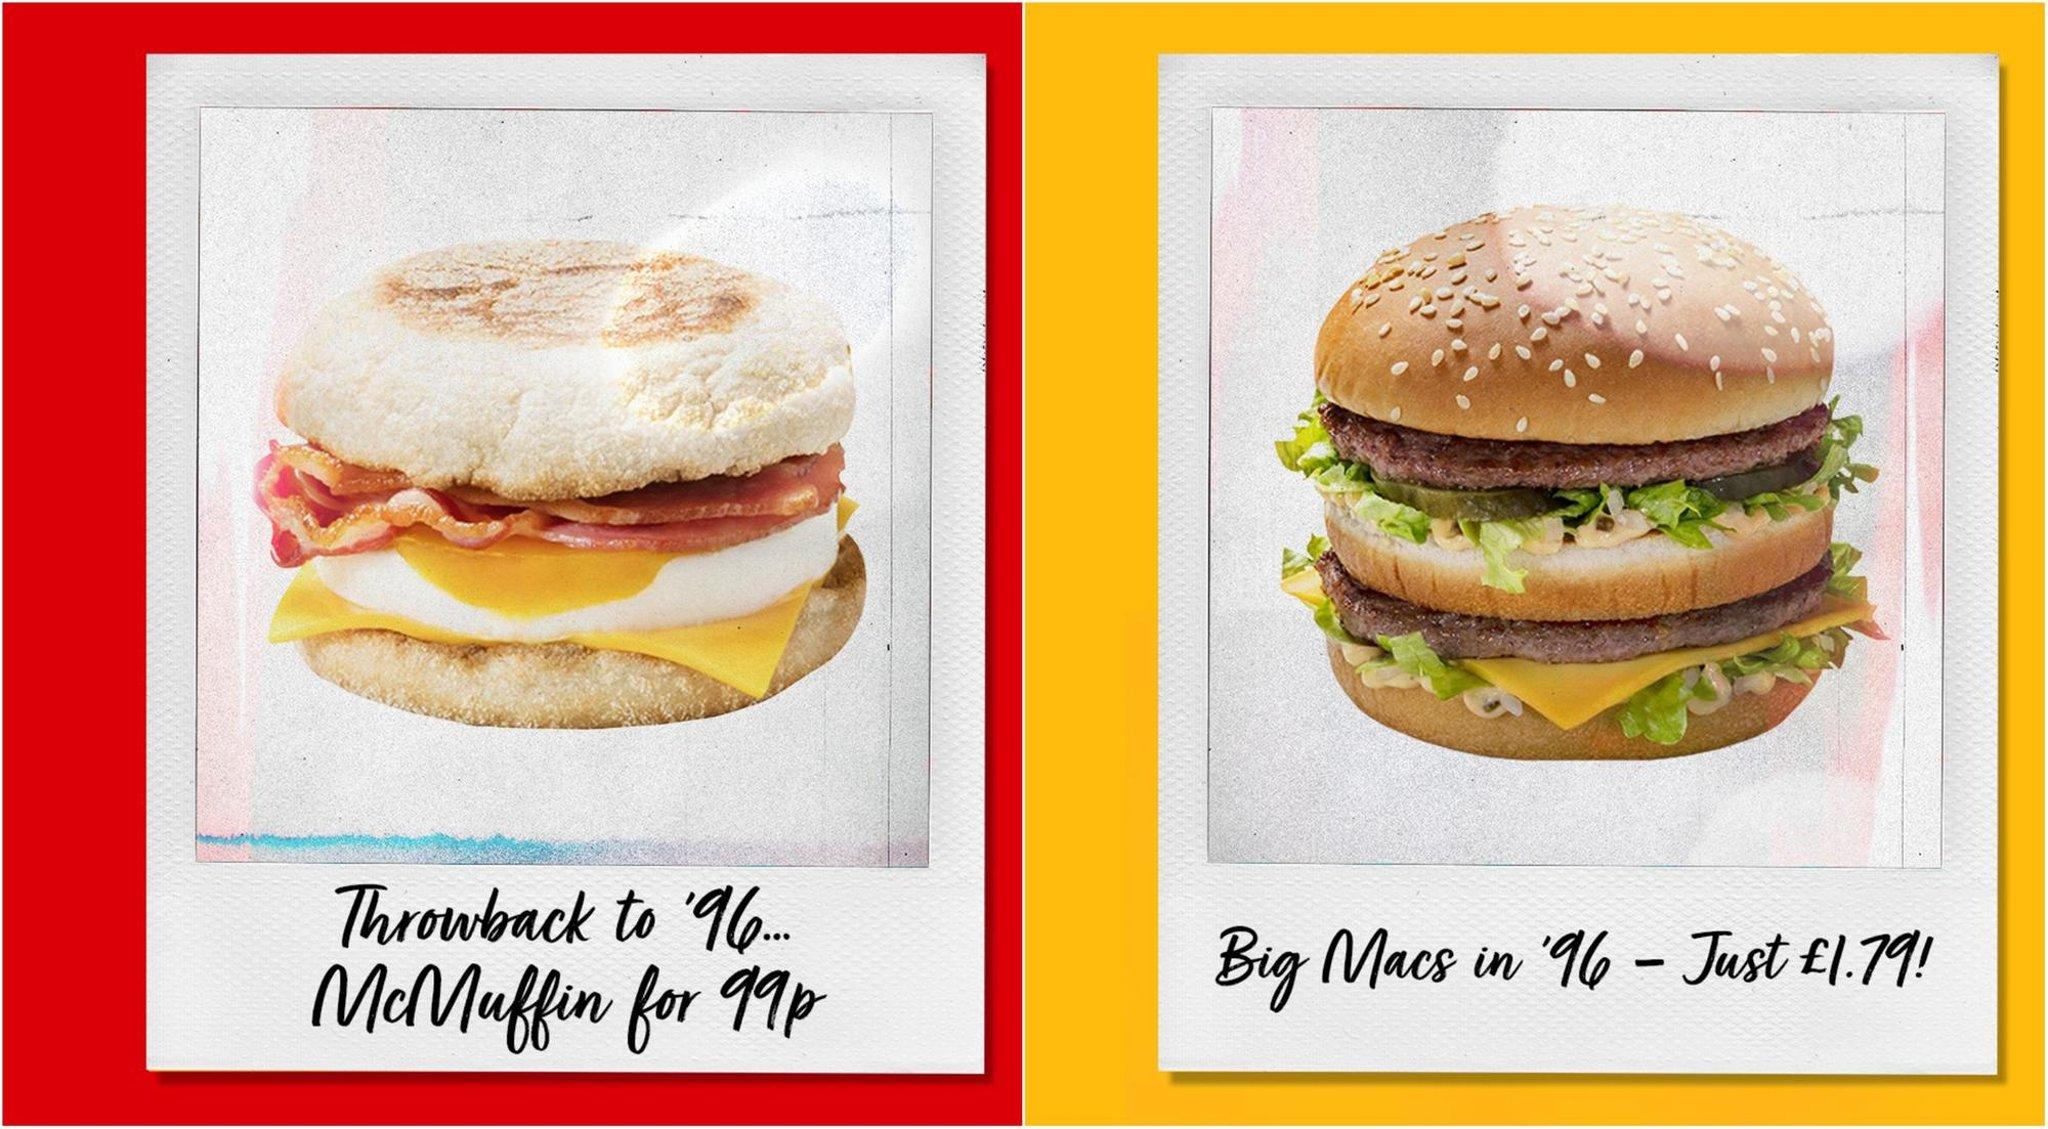 England vs Scotland: McDonald's rolls back prices 25 years ...